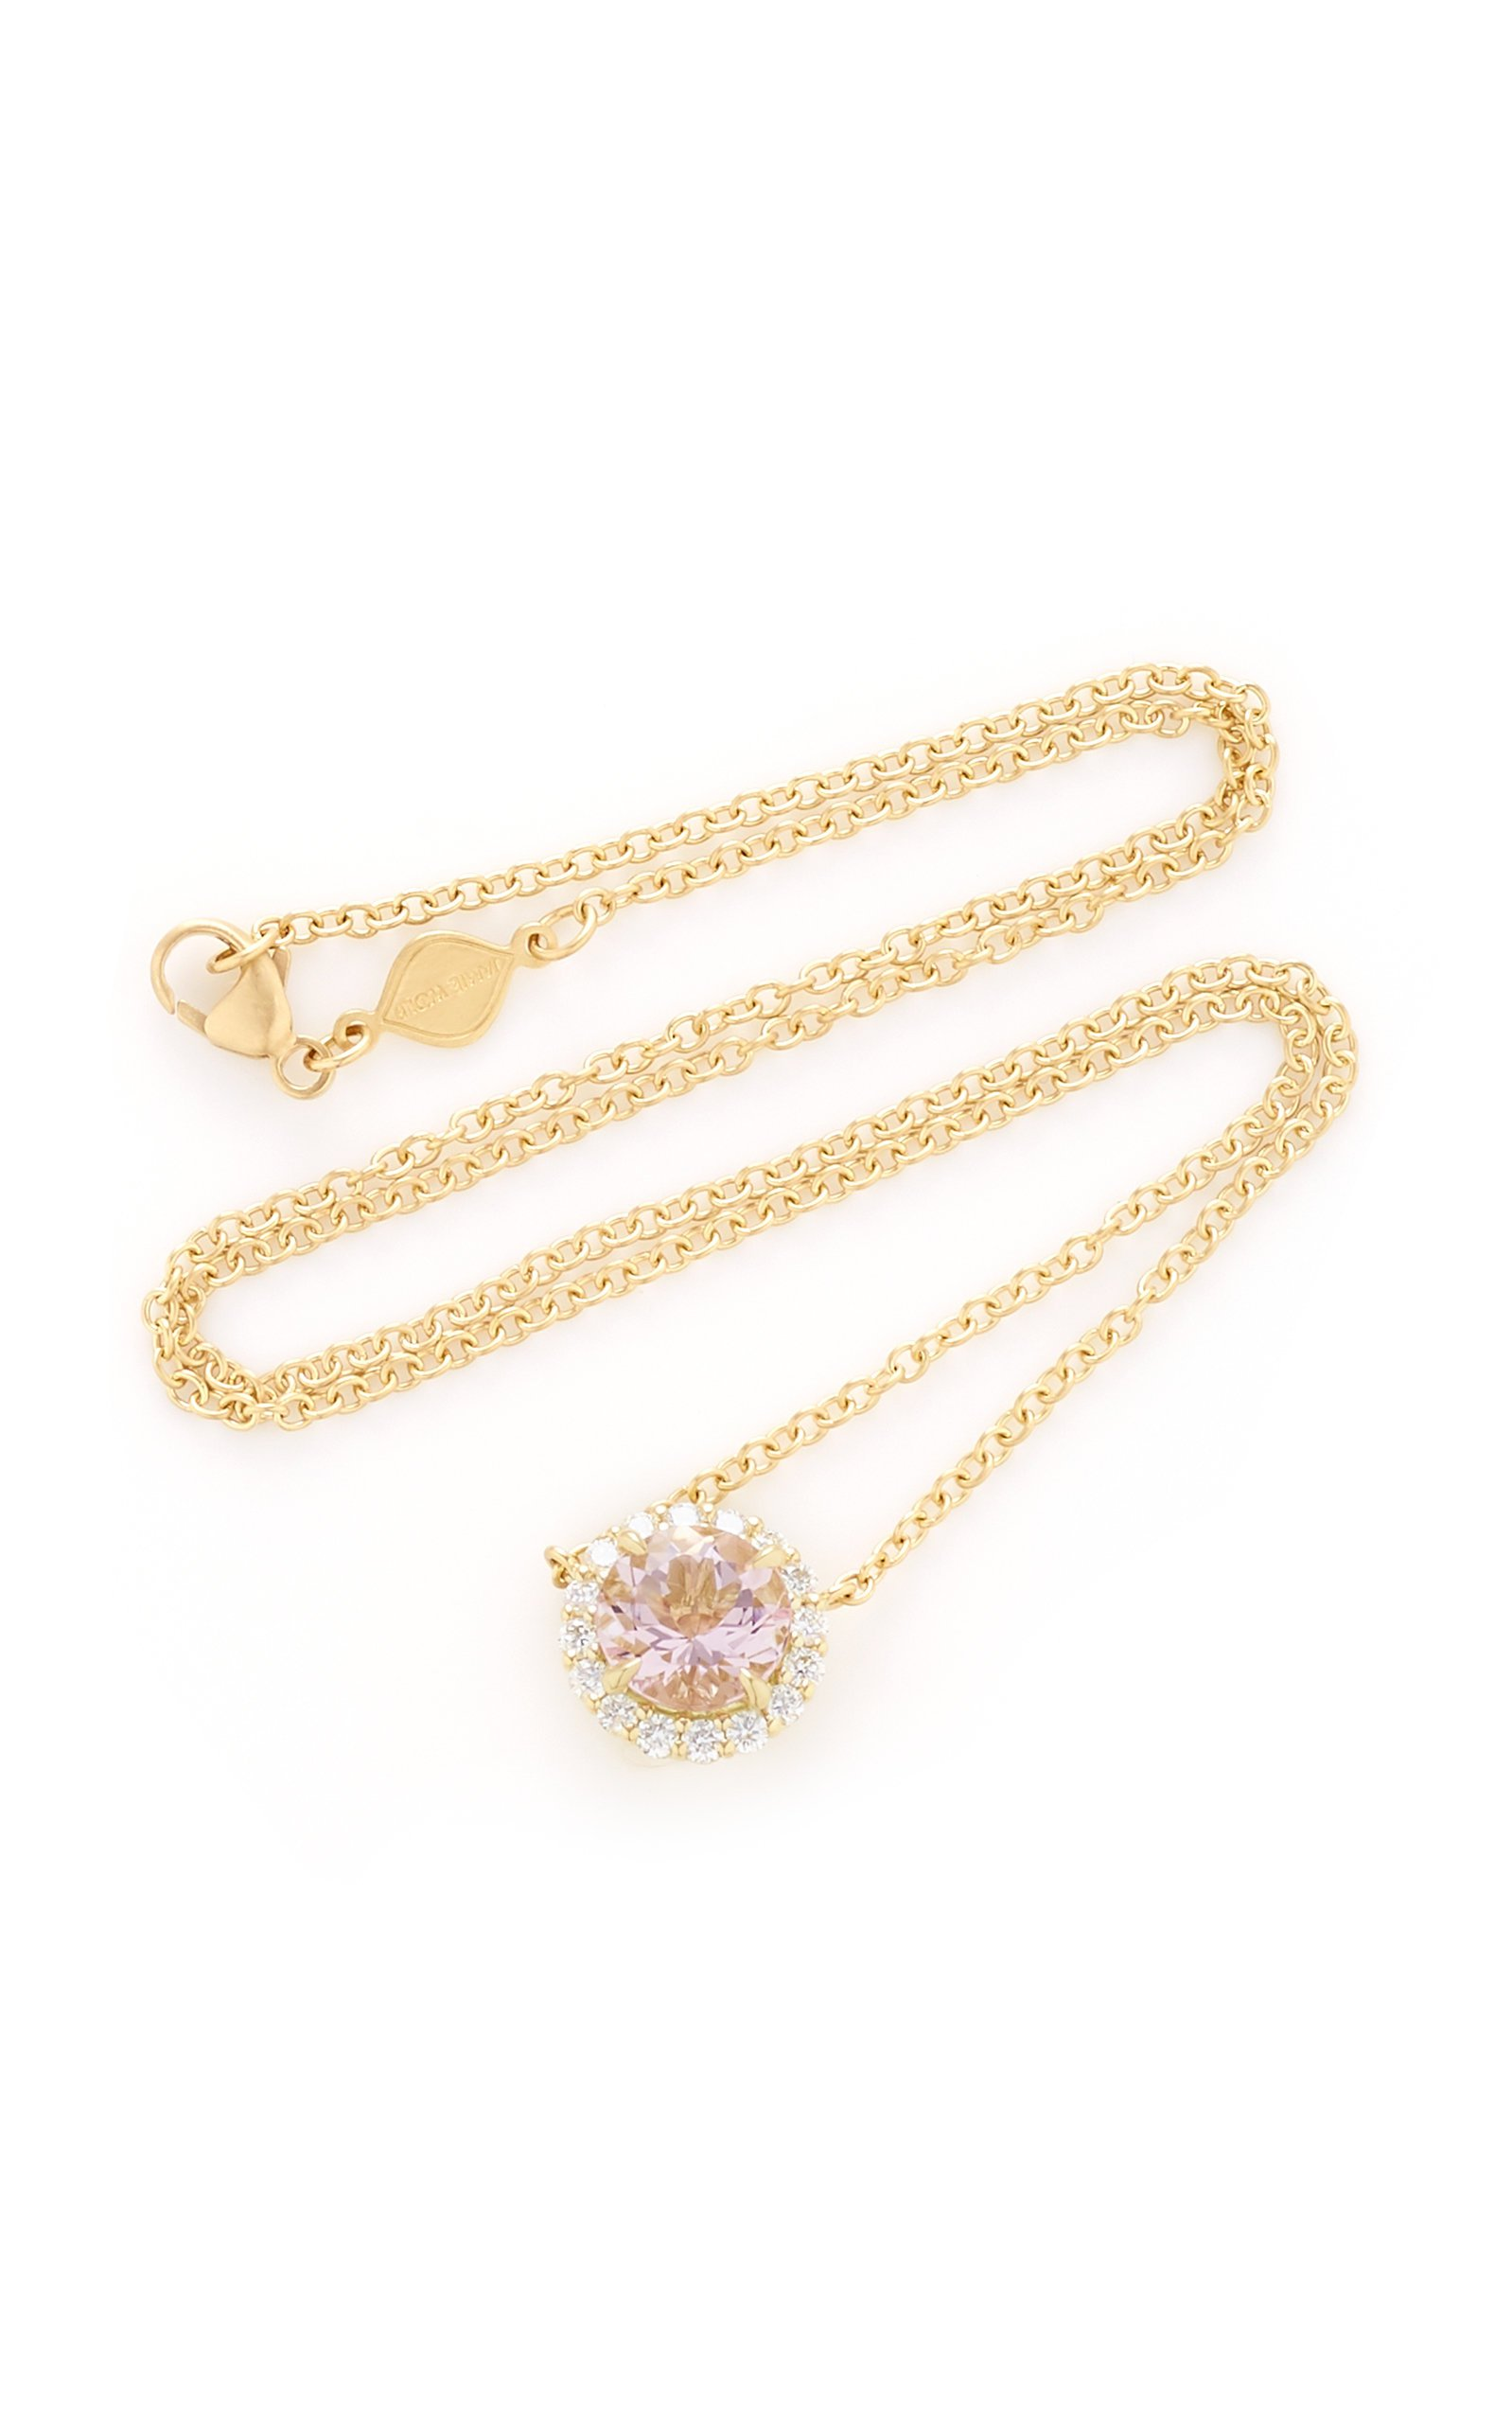 Jamie Wolf 18K Yellow Gold Diamond Edge Morganite Necklace